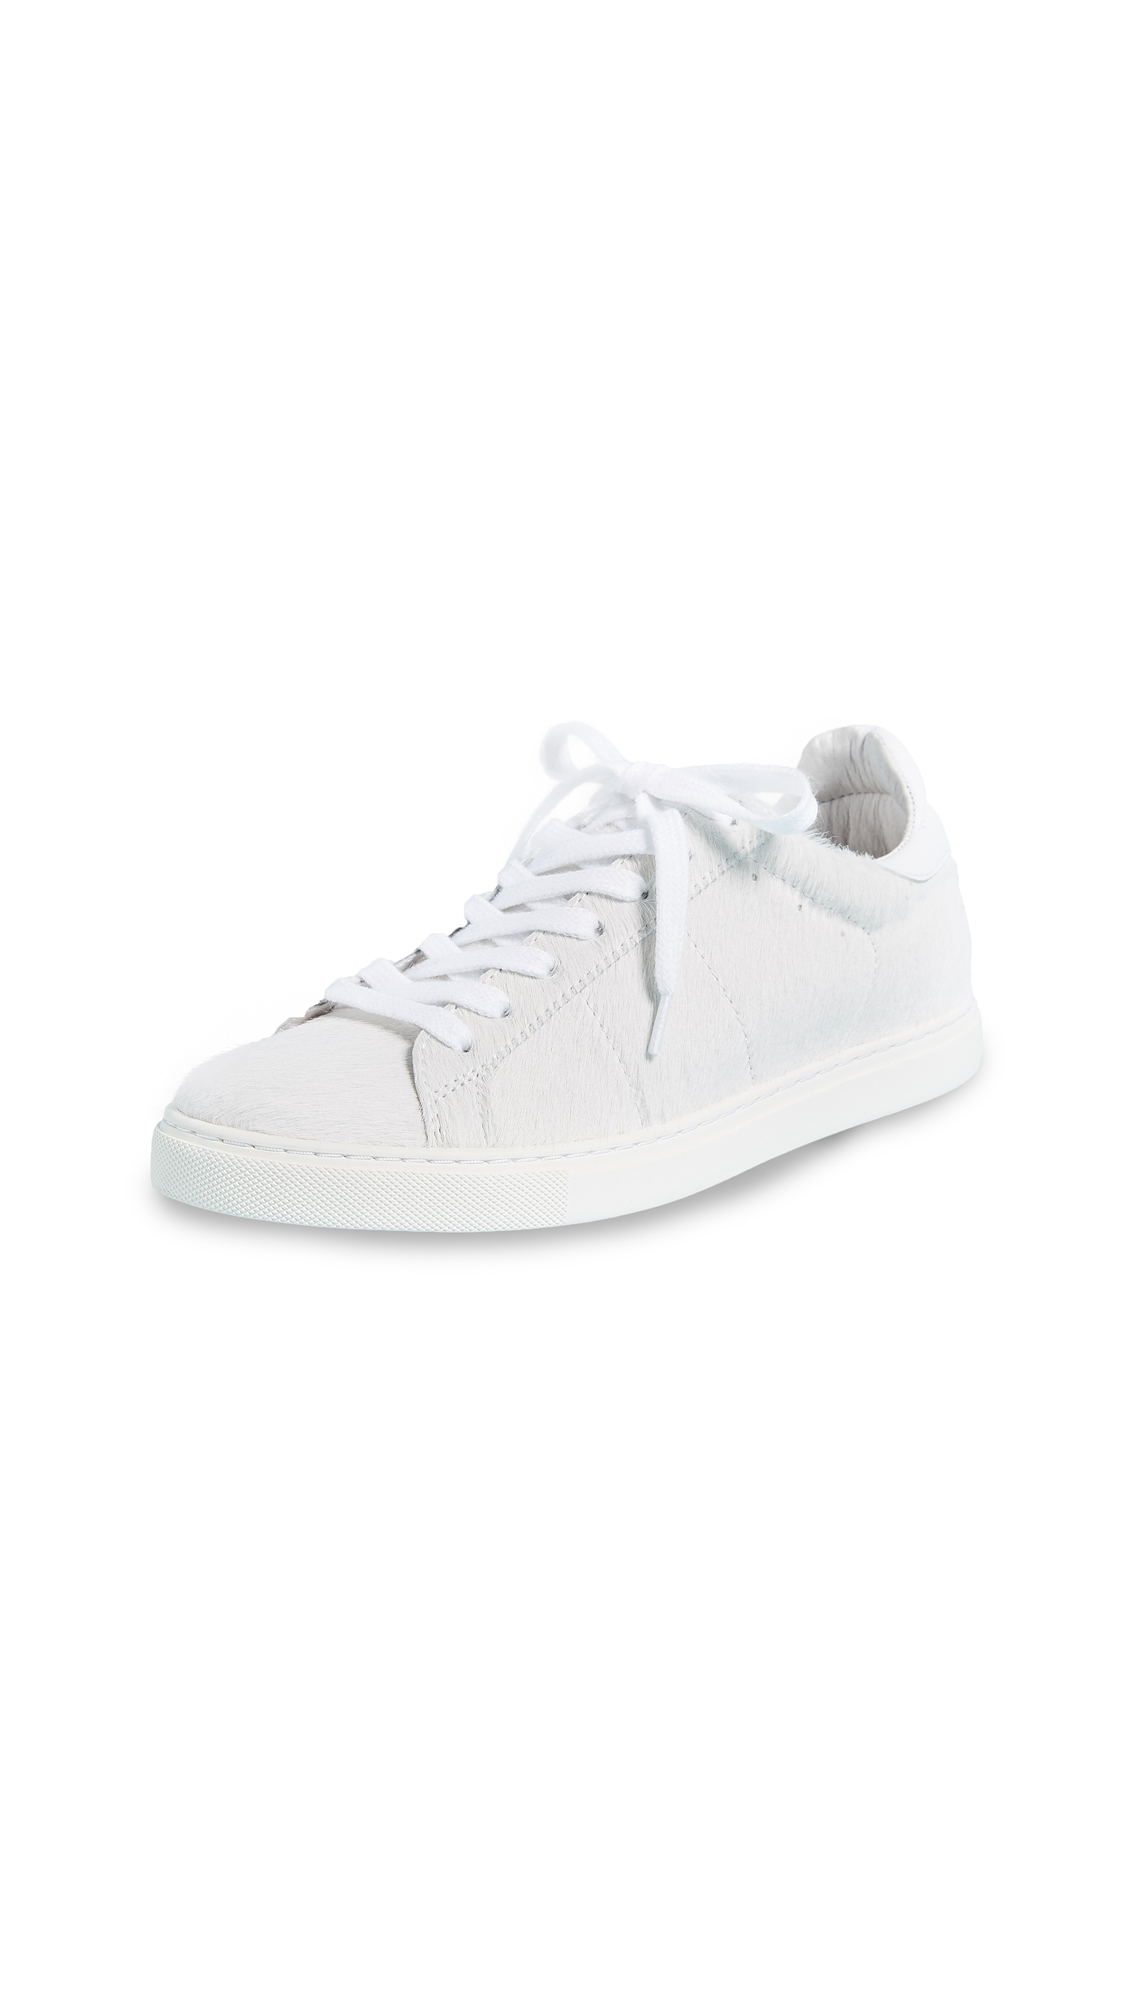 IRO Pony Sneakers - White